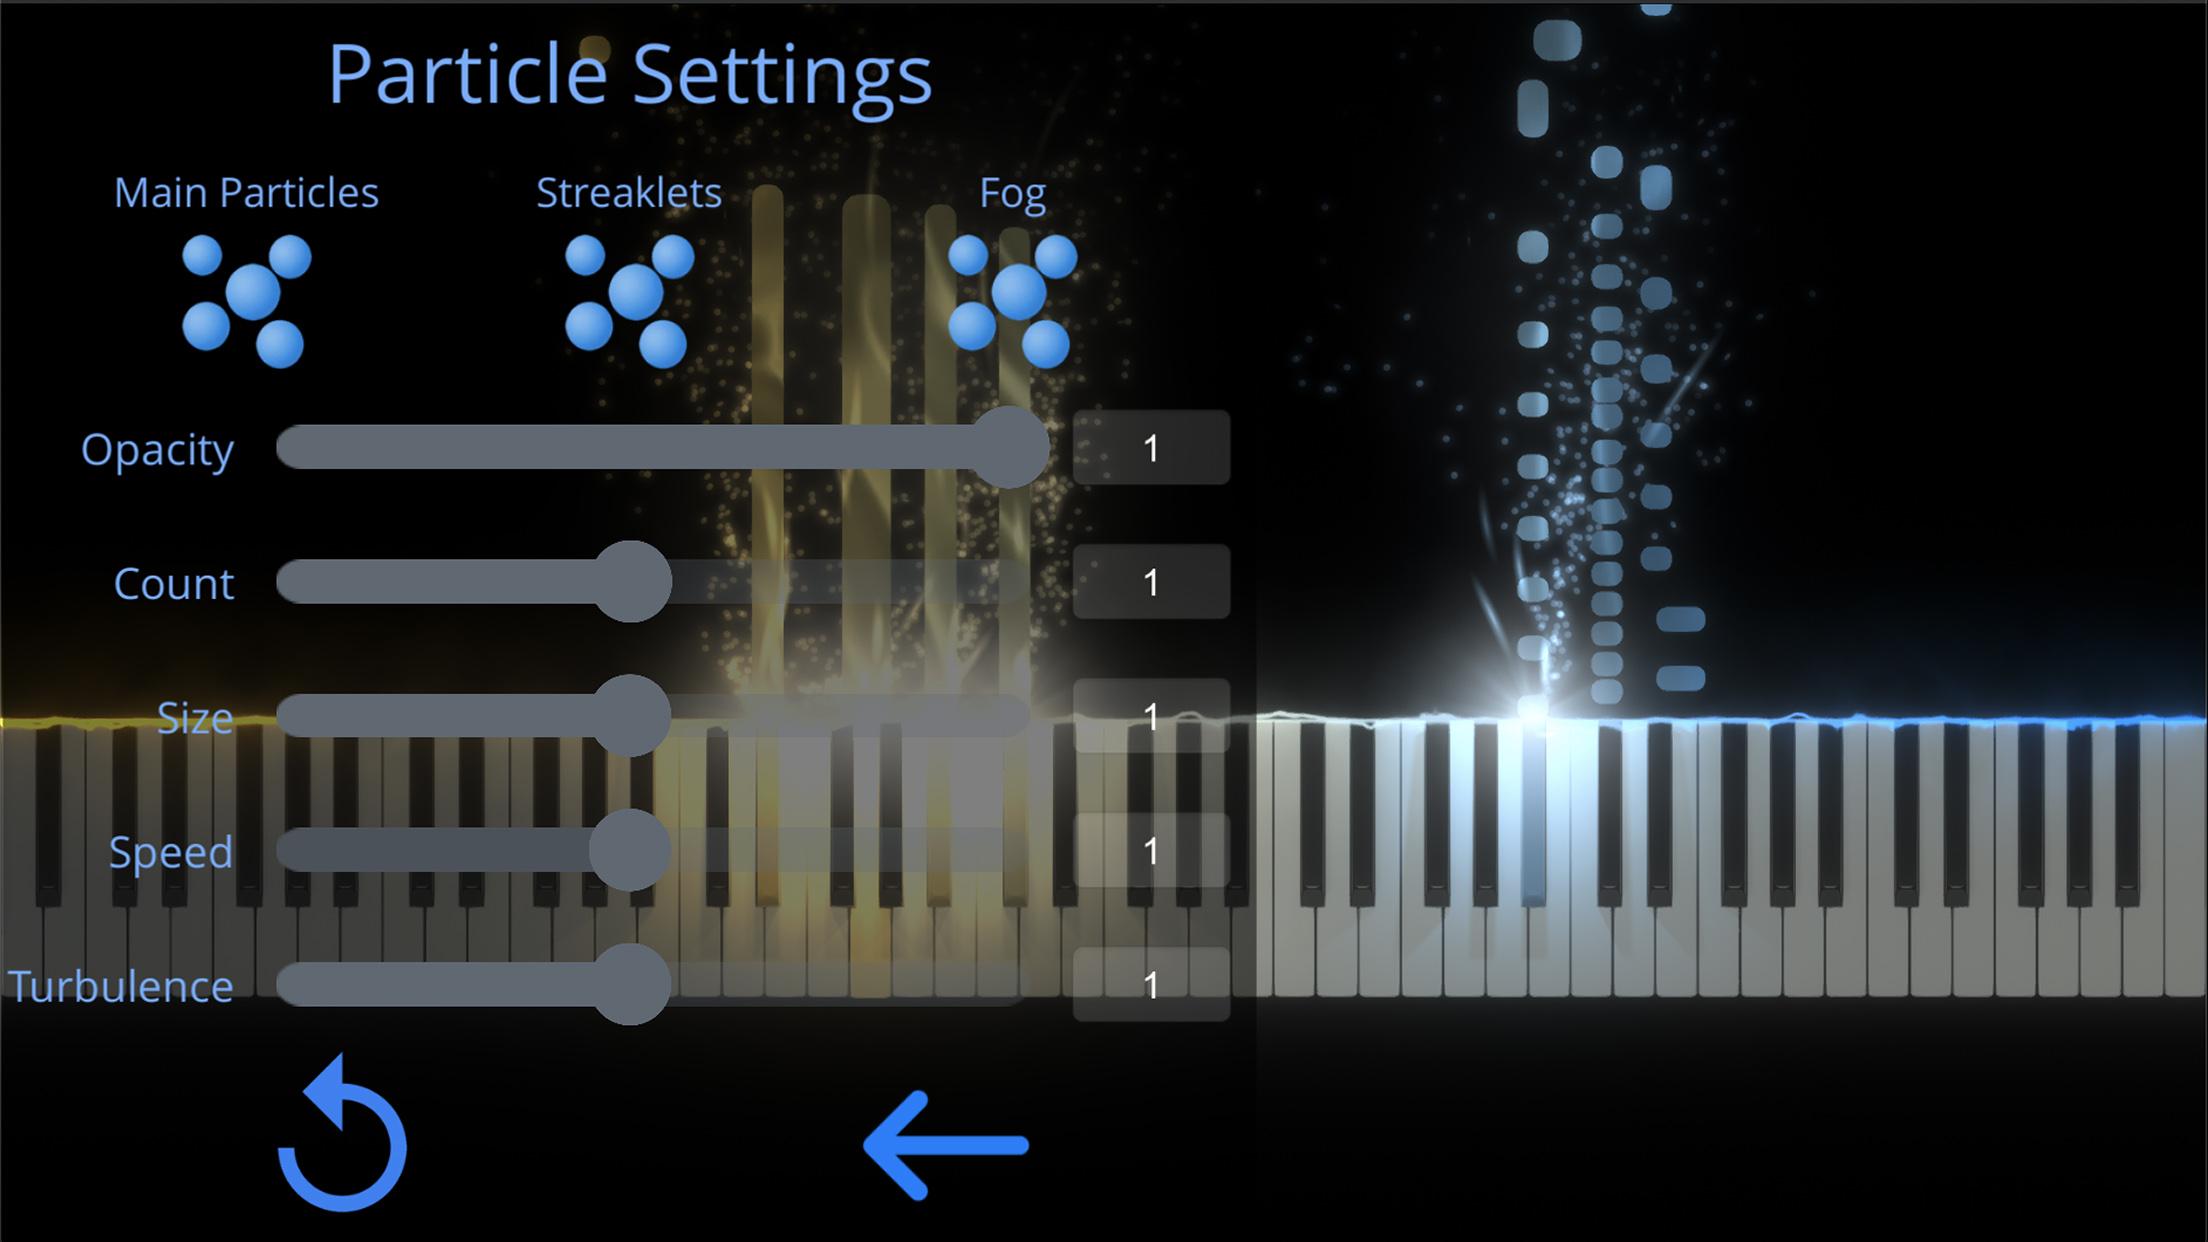 SeeMusic Particle Settings